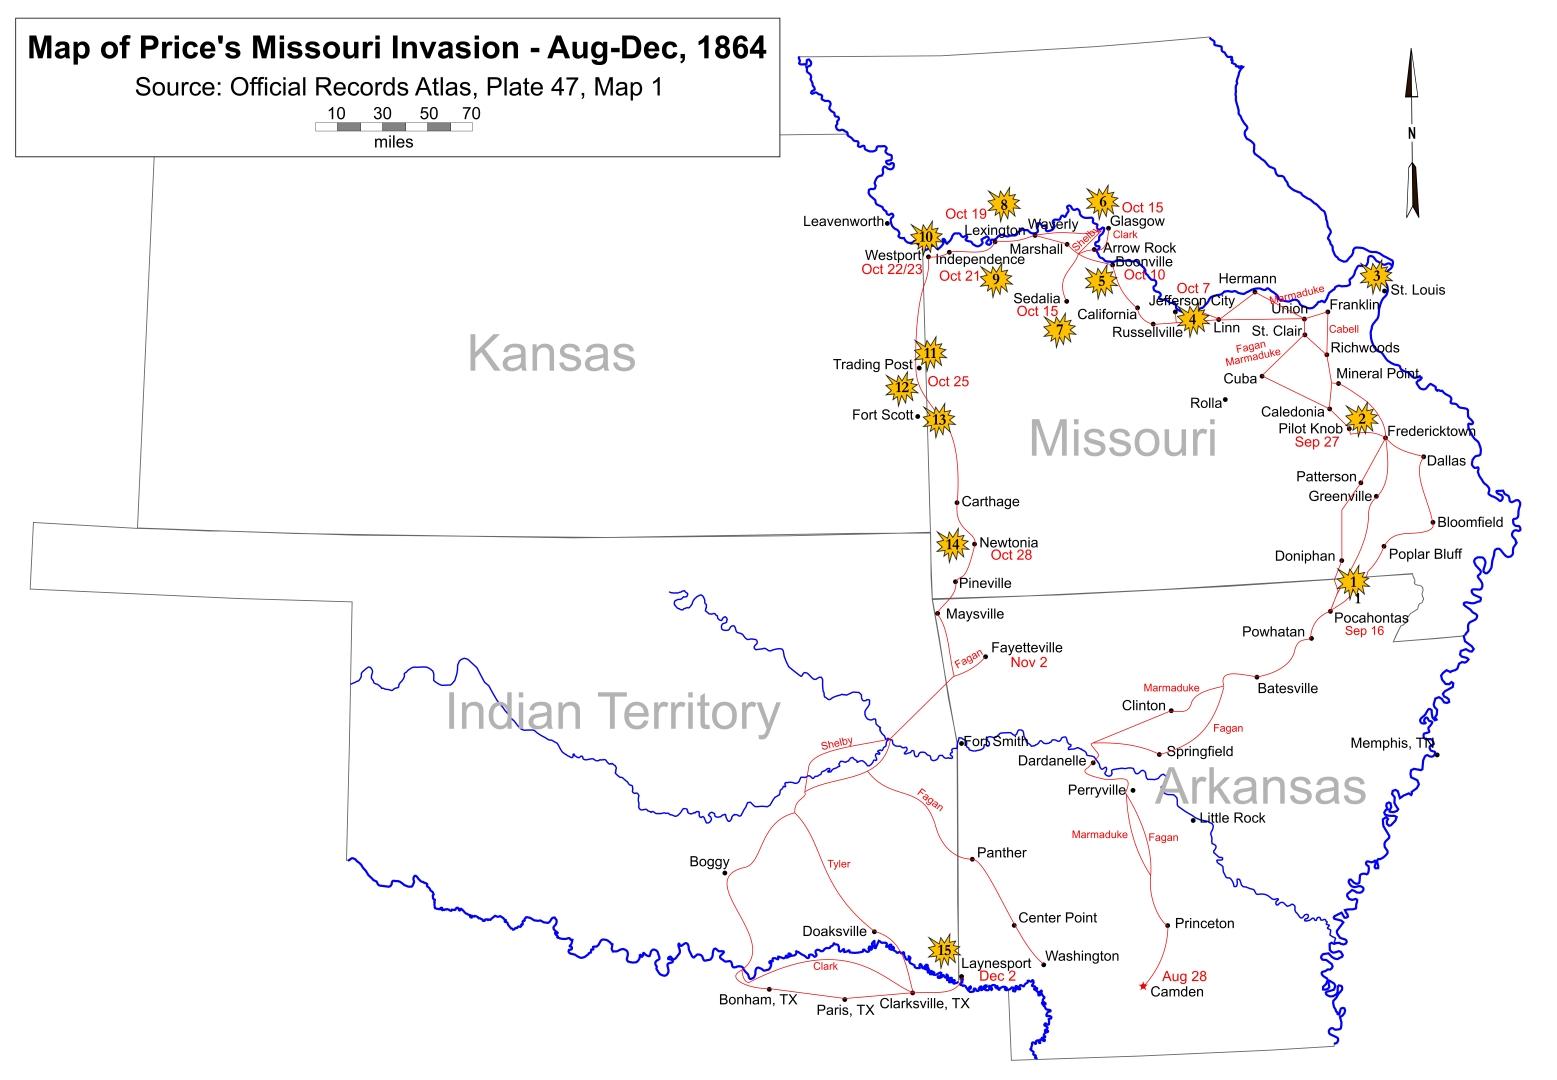 Annotated Map of Price's 1864 Missouri Invasion